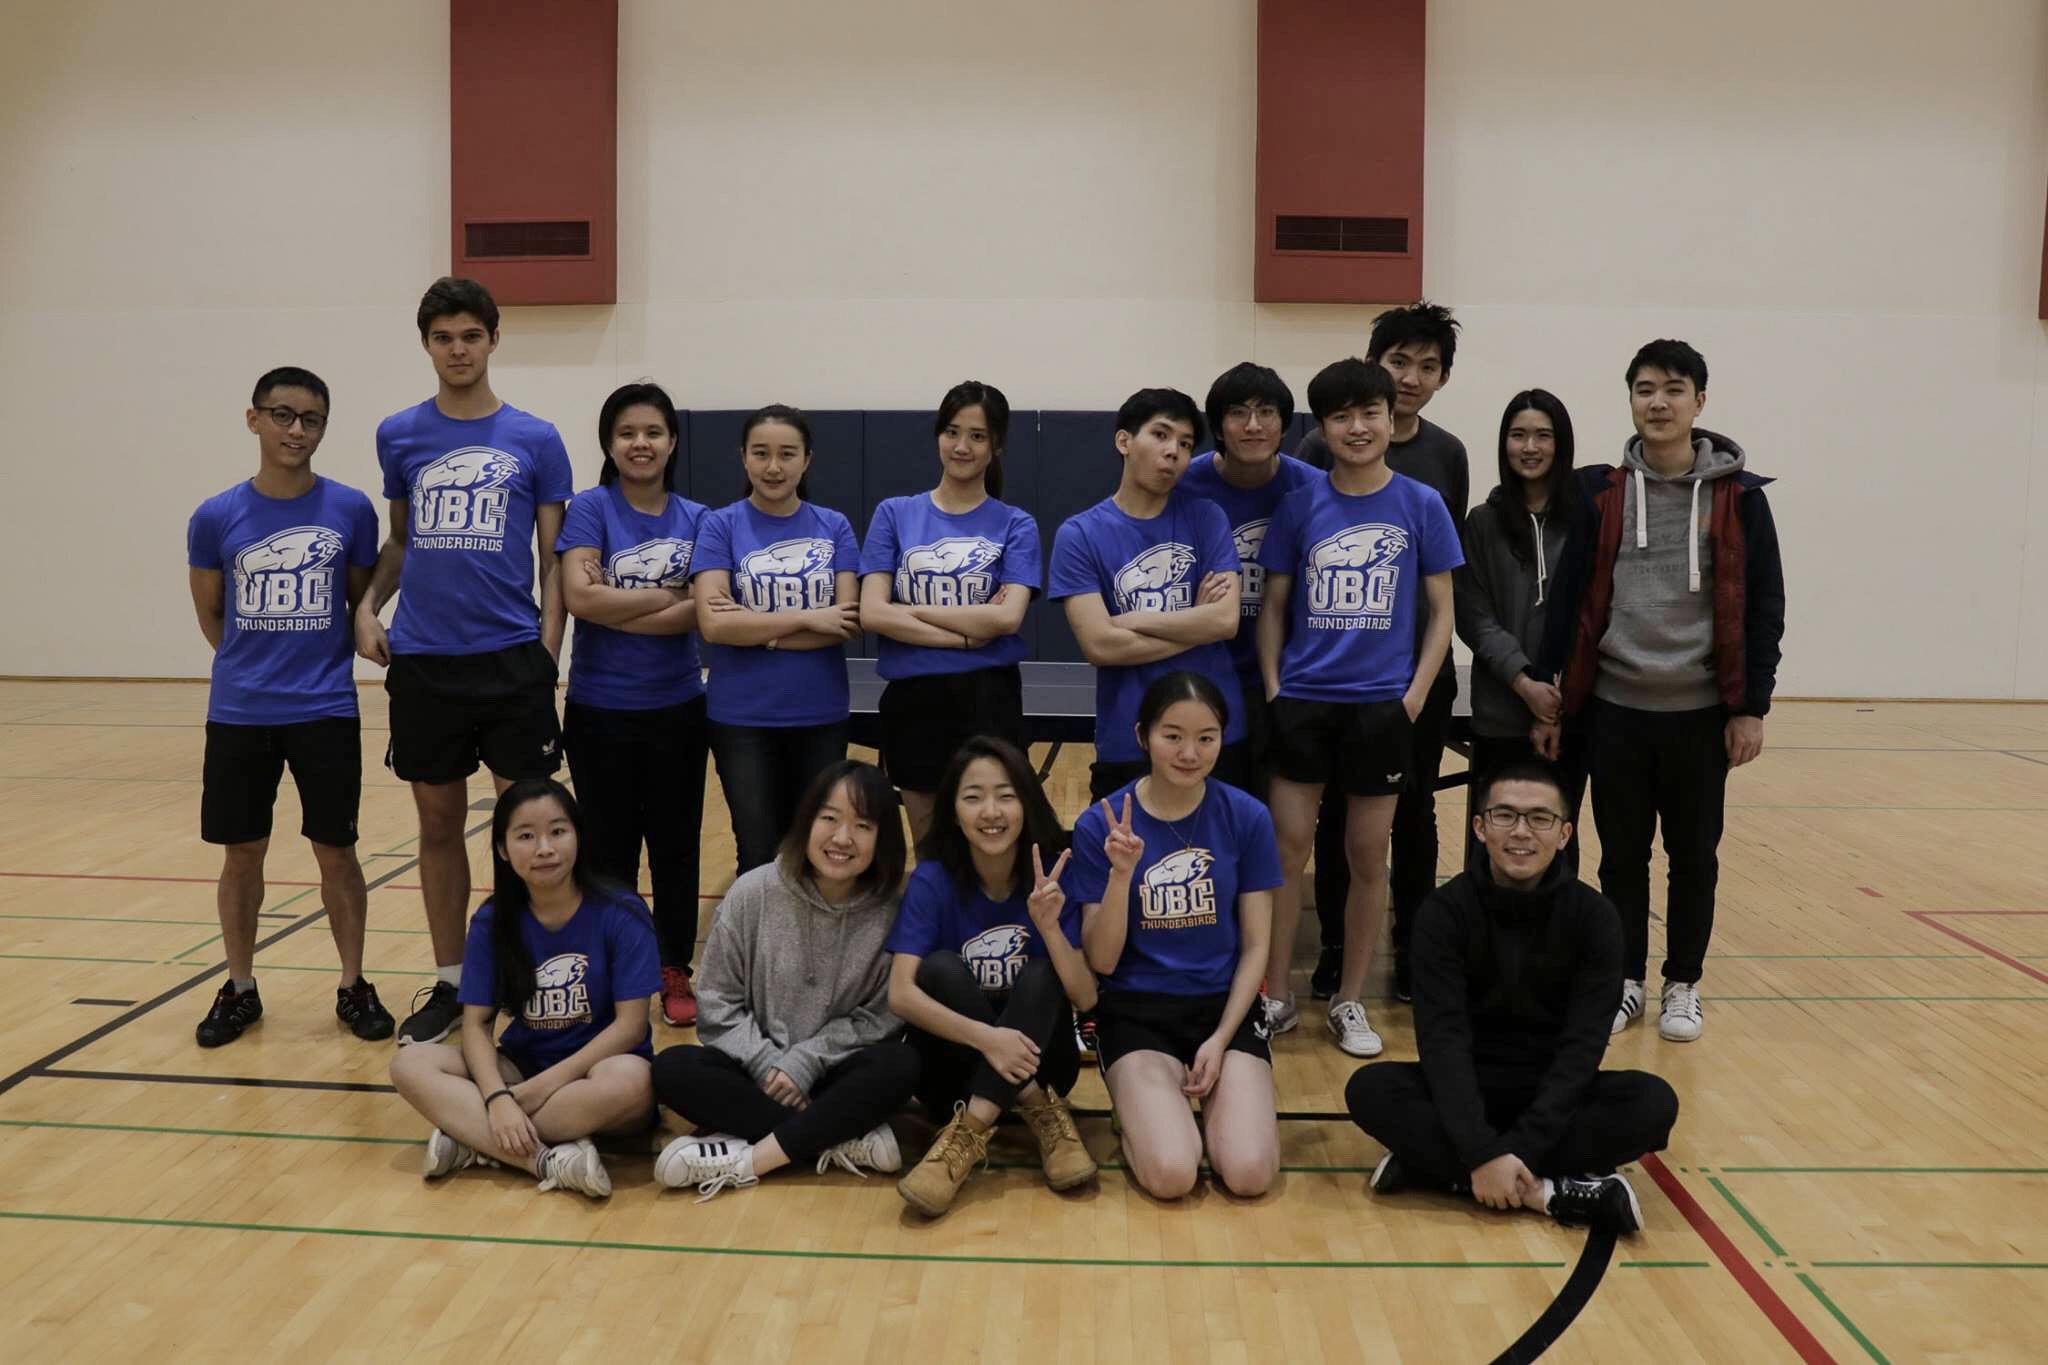 UBC's table tennis team.